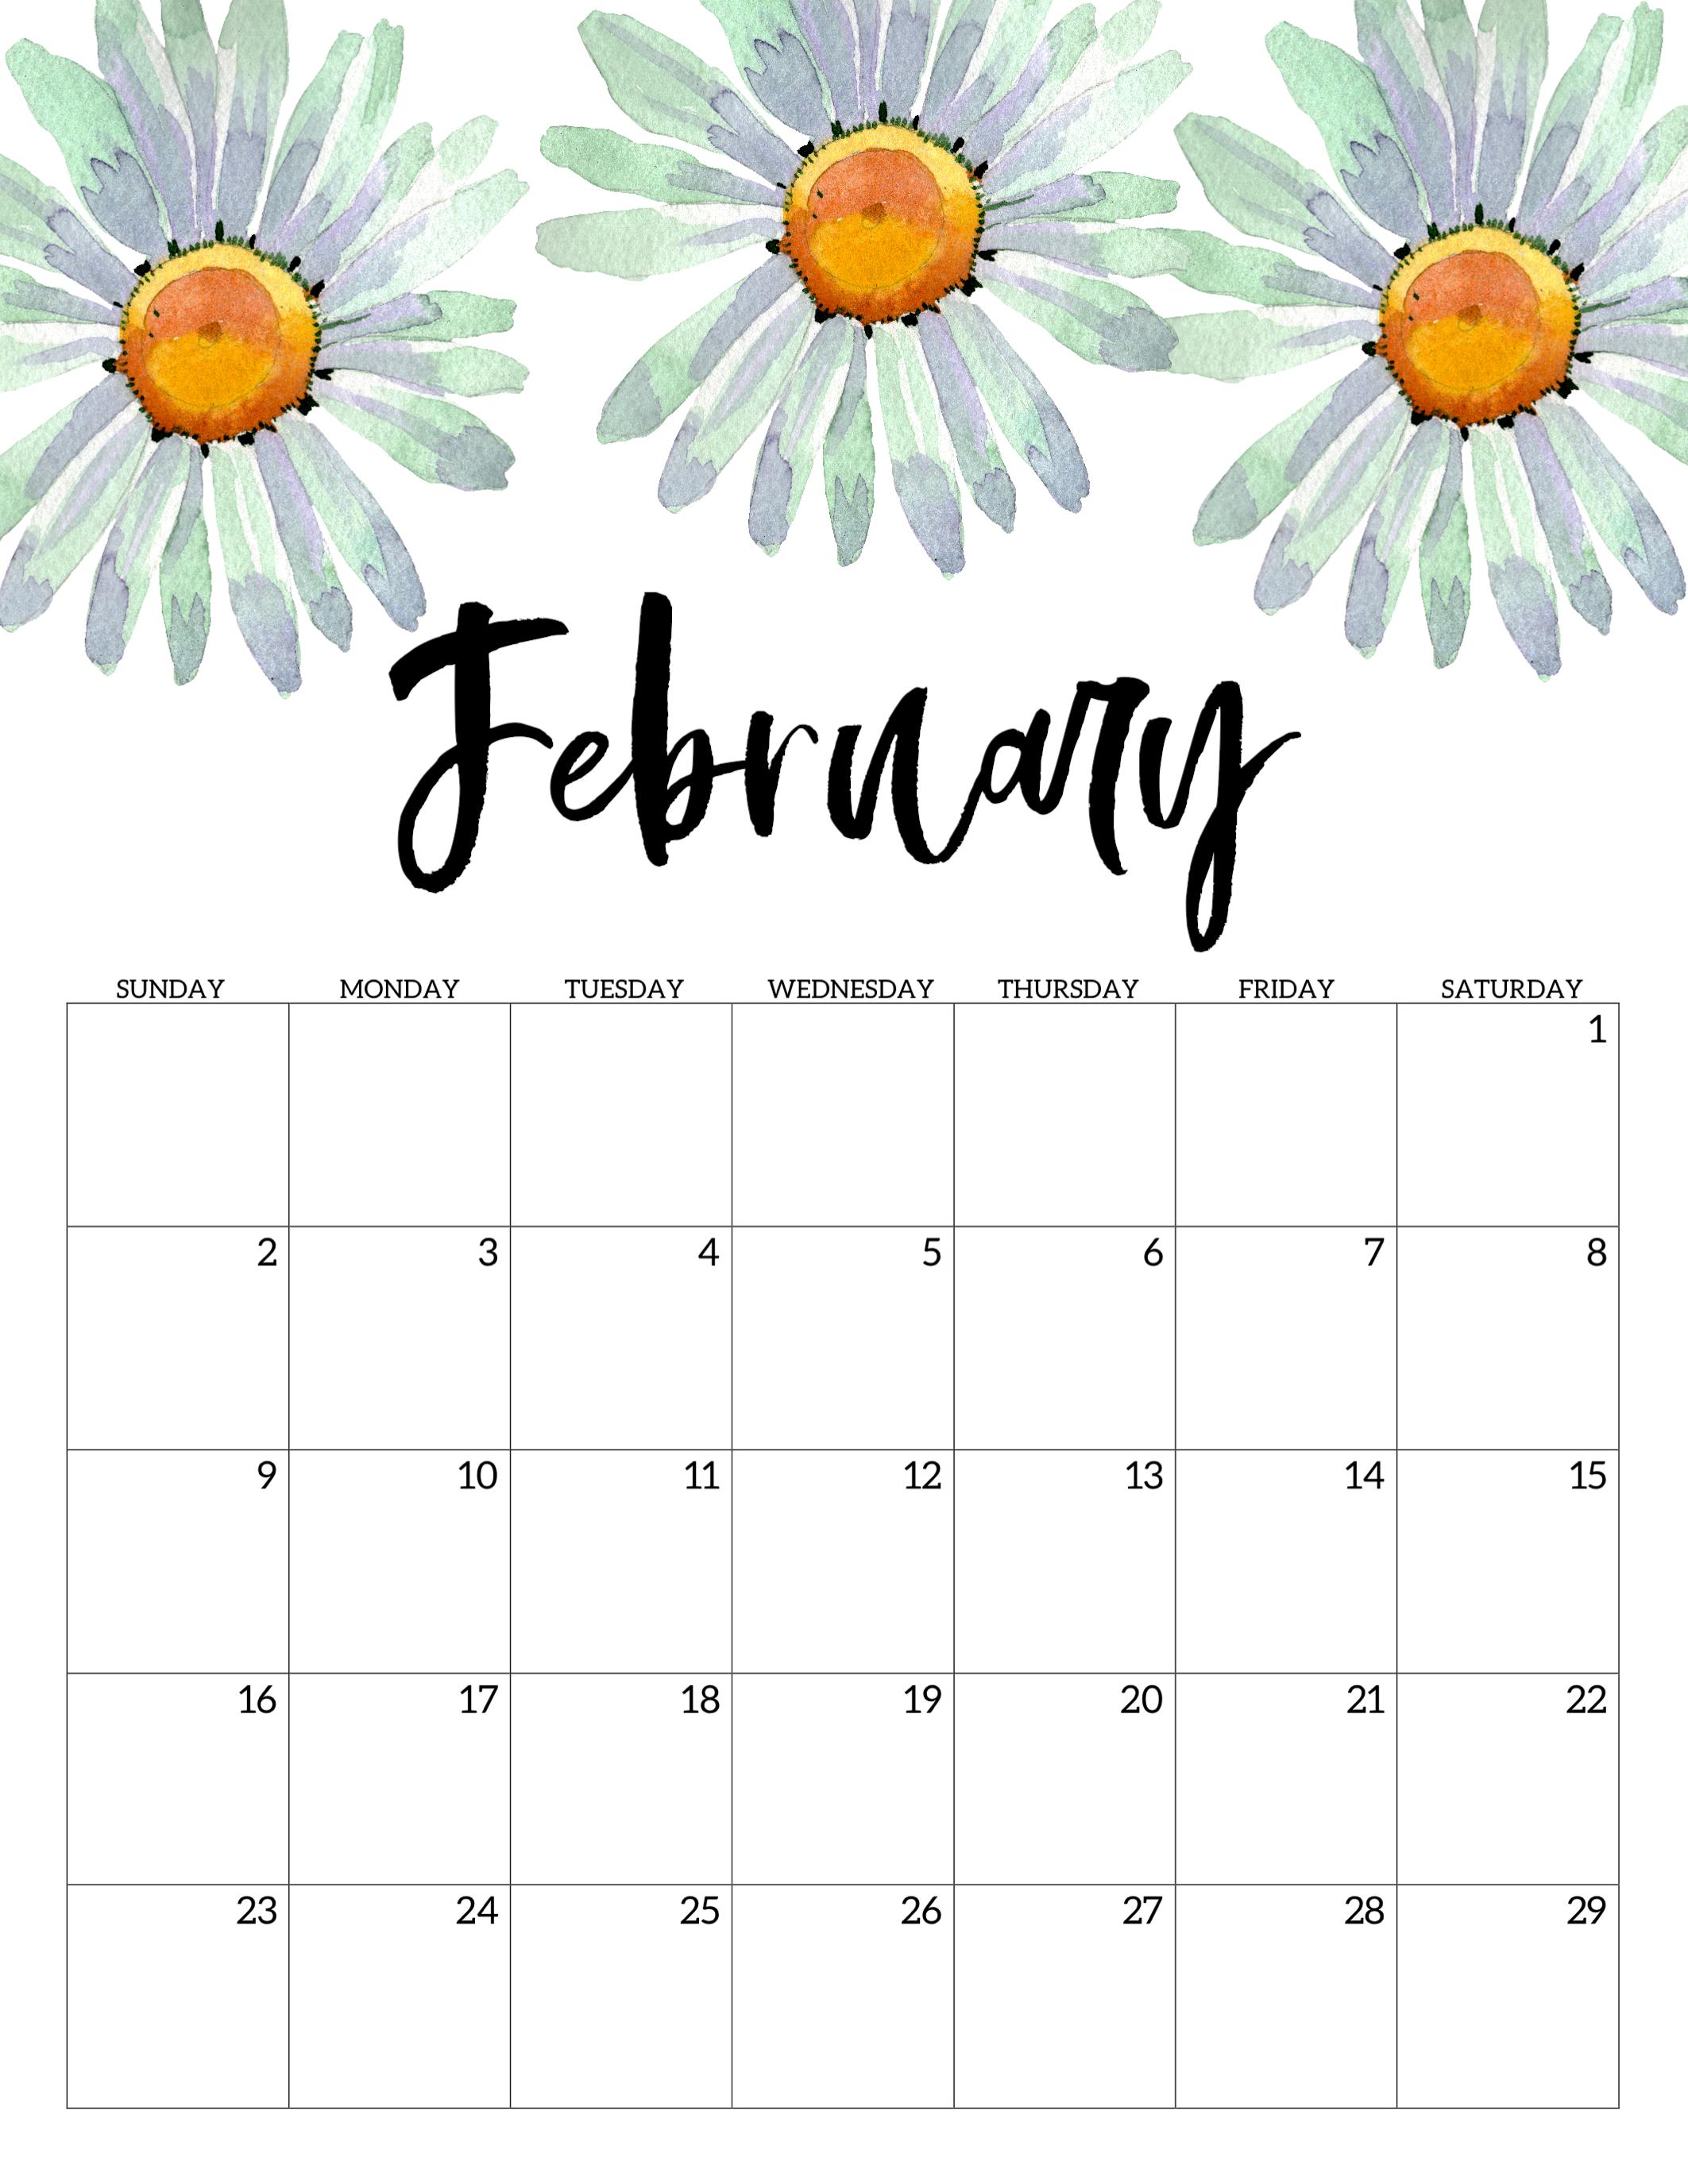 Cute February 2020 Calendar 2020 Free Printable Calendar   Floral   Paper Trail Design